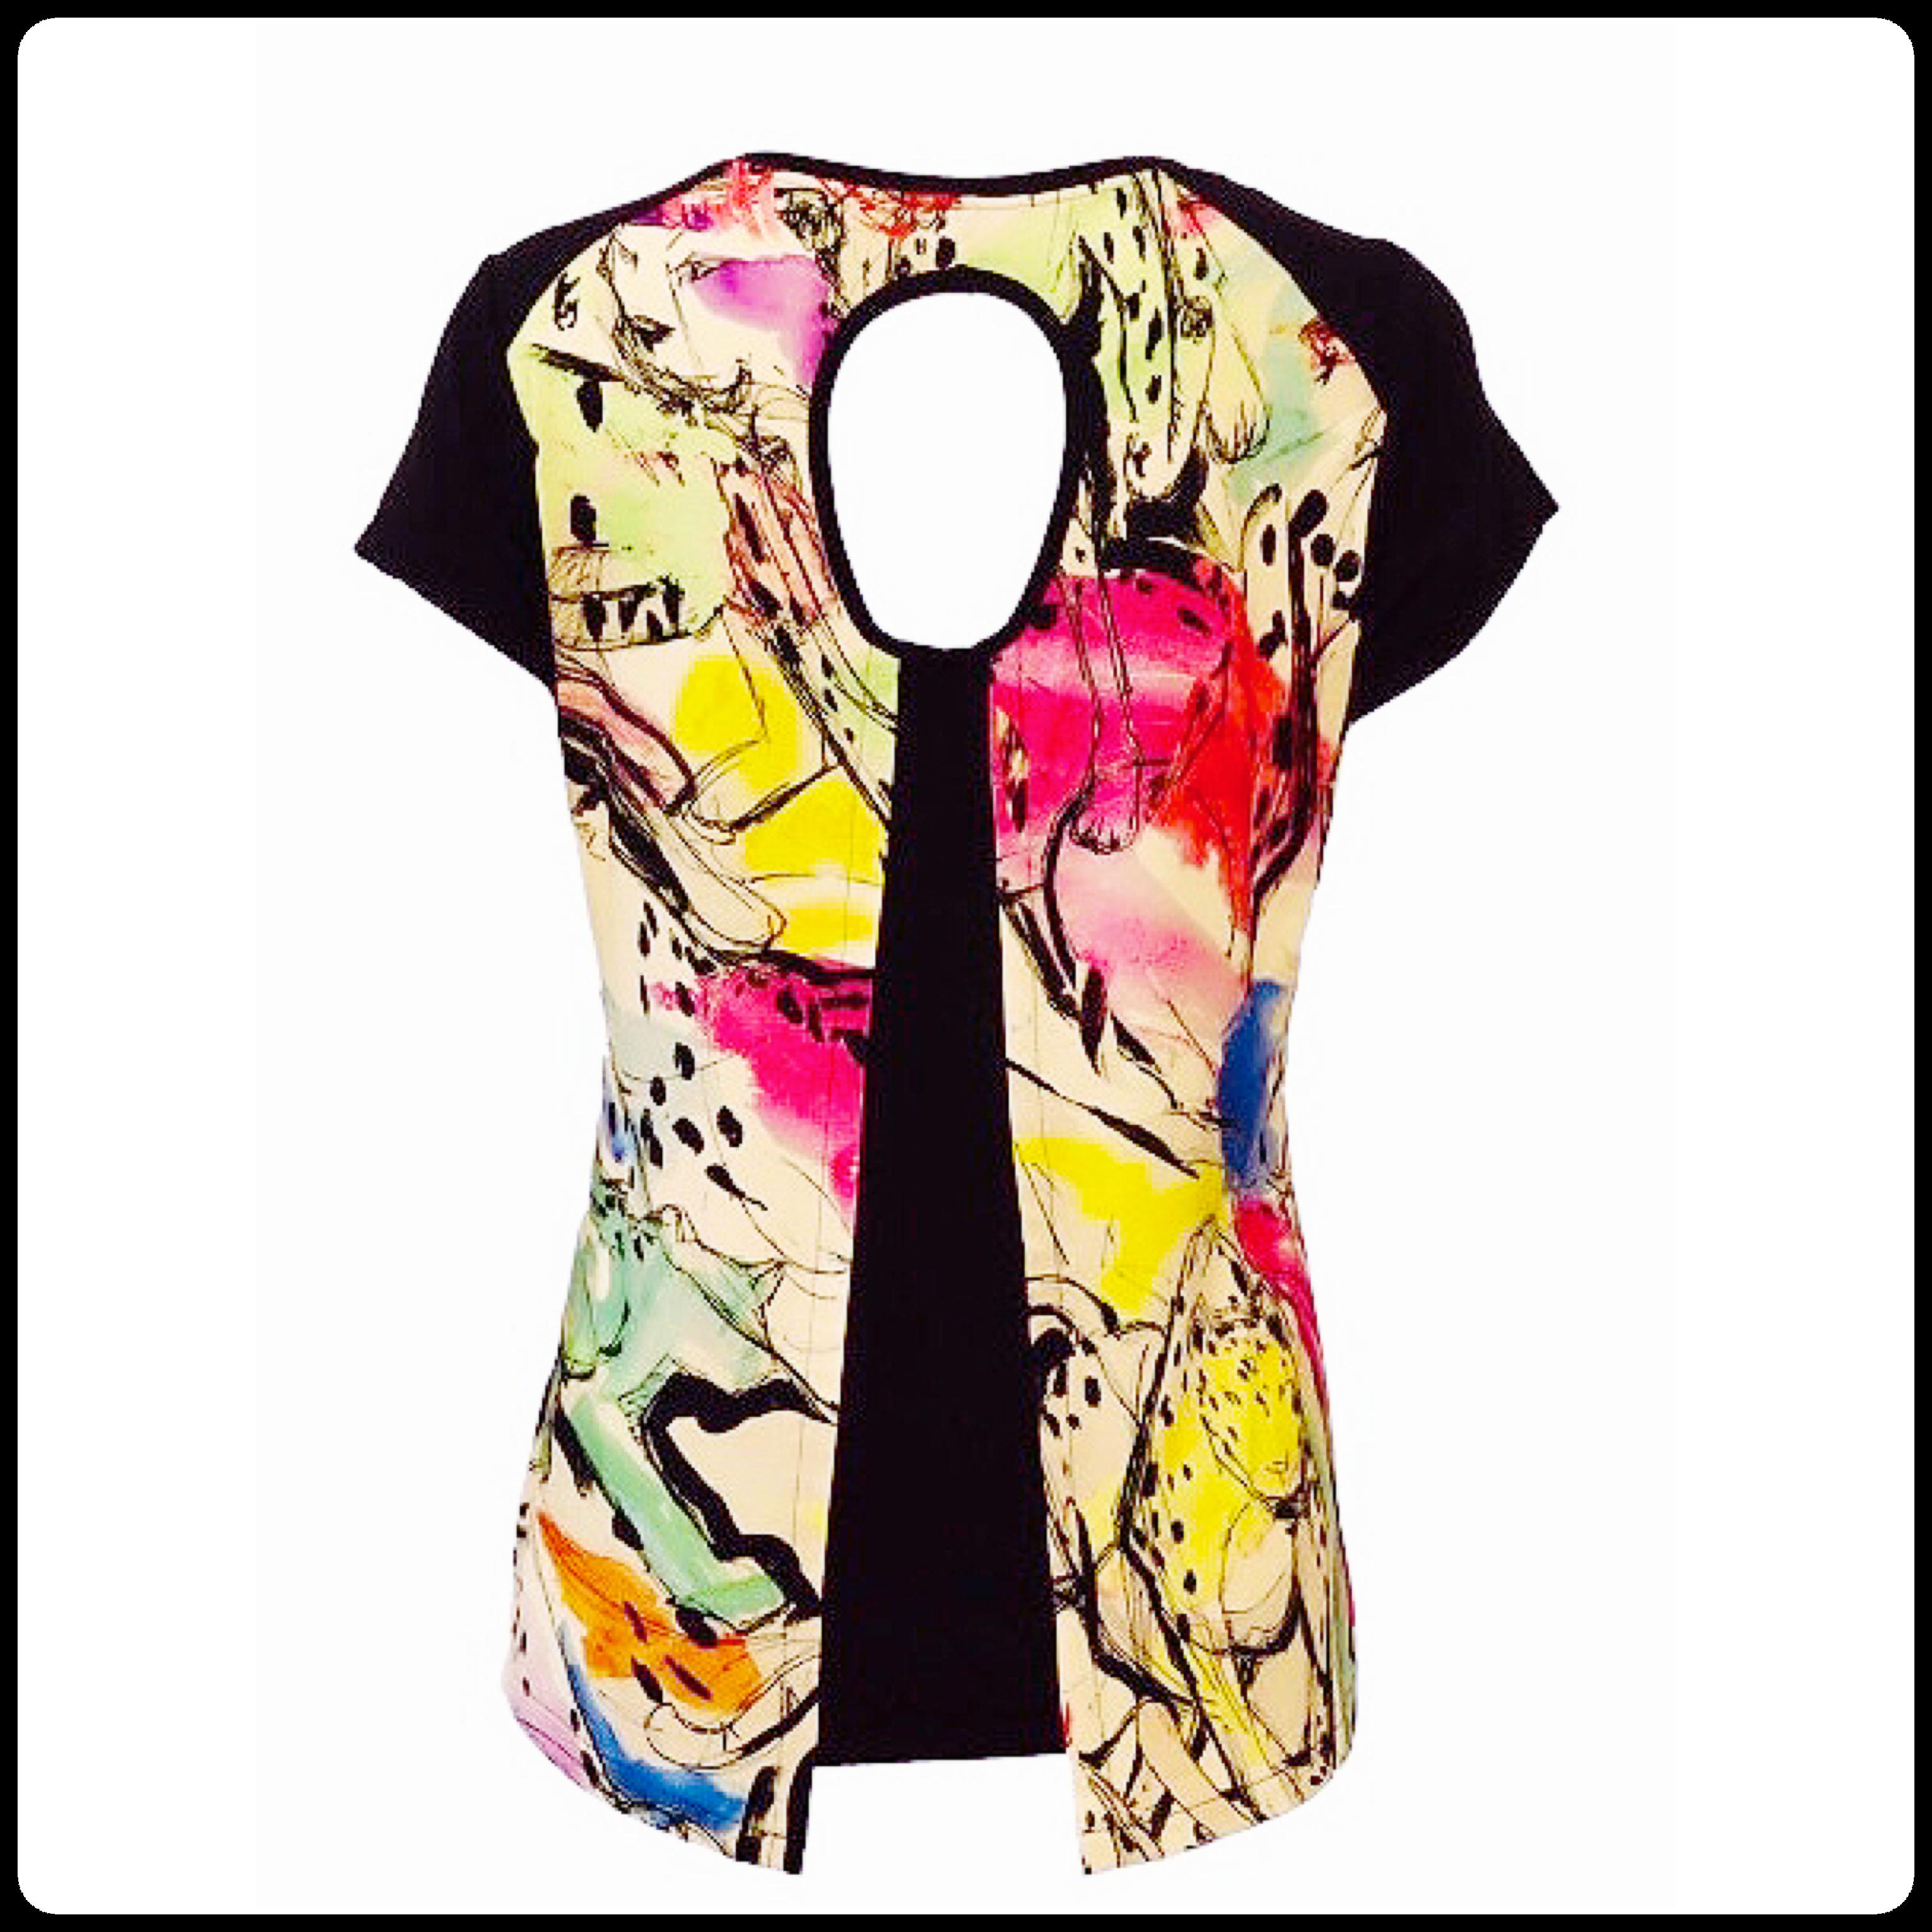 Maloka: Pink Leopard Faux Split Abstract Art T-Shirt (1 Left!)